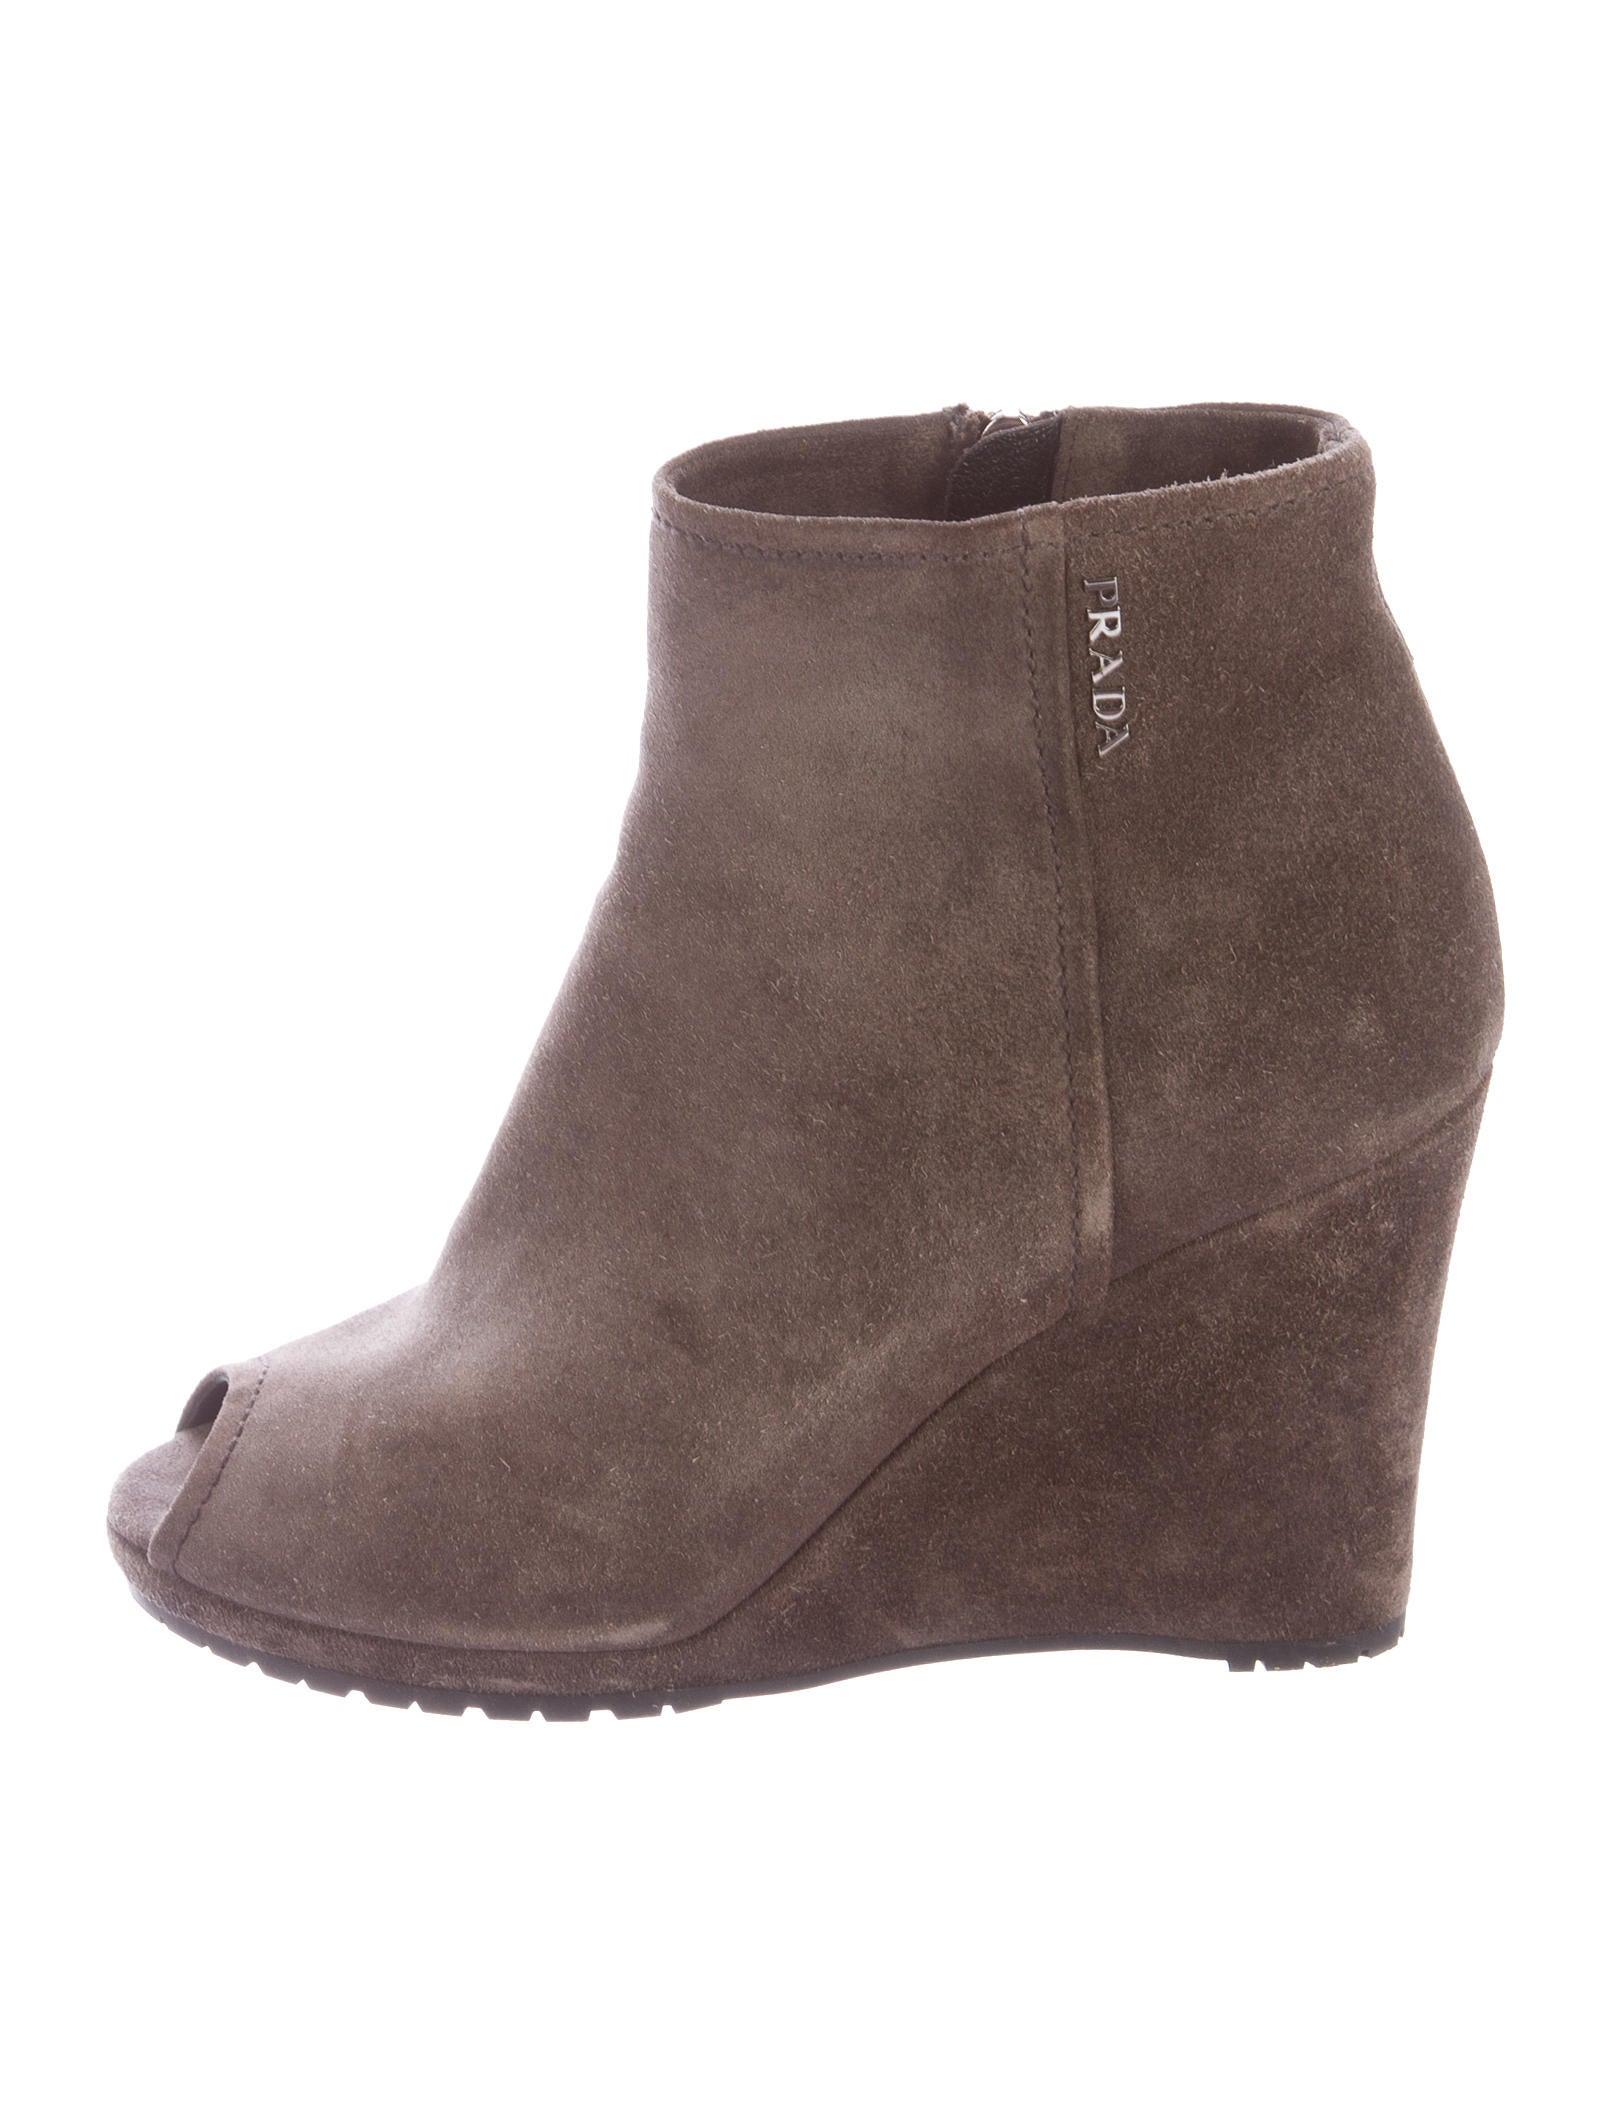 prada sport peep toe wedge ankle boots shoes wpr35388